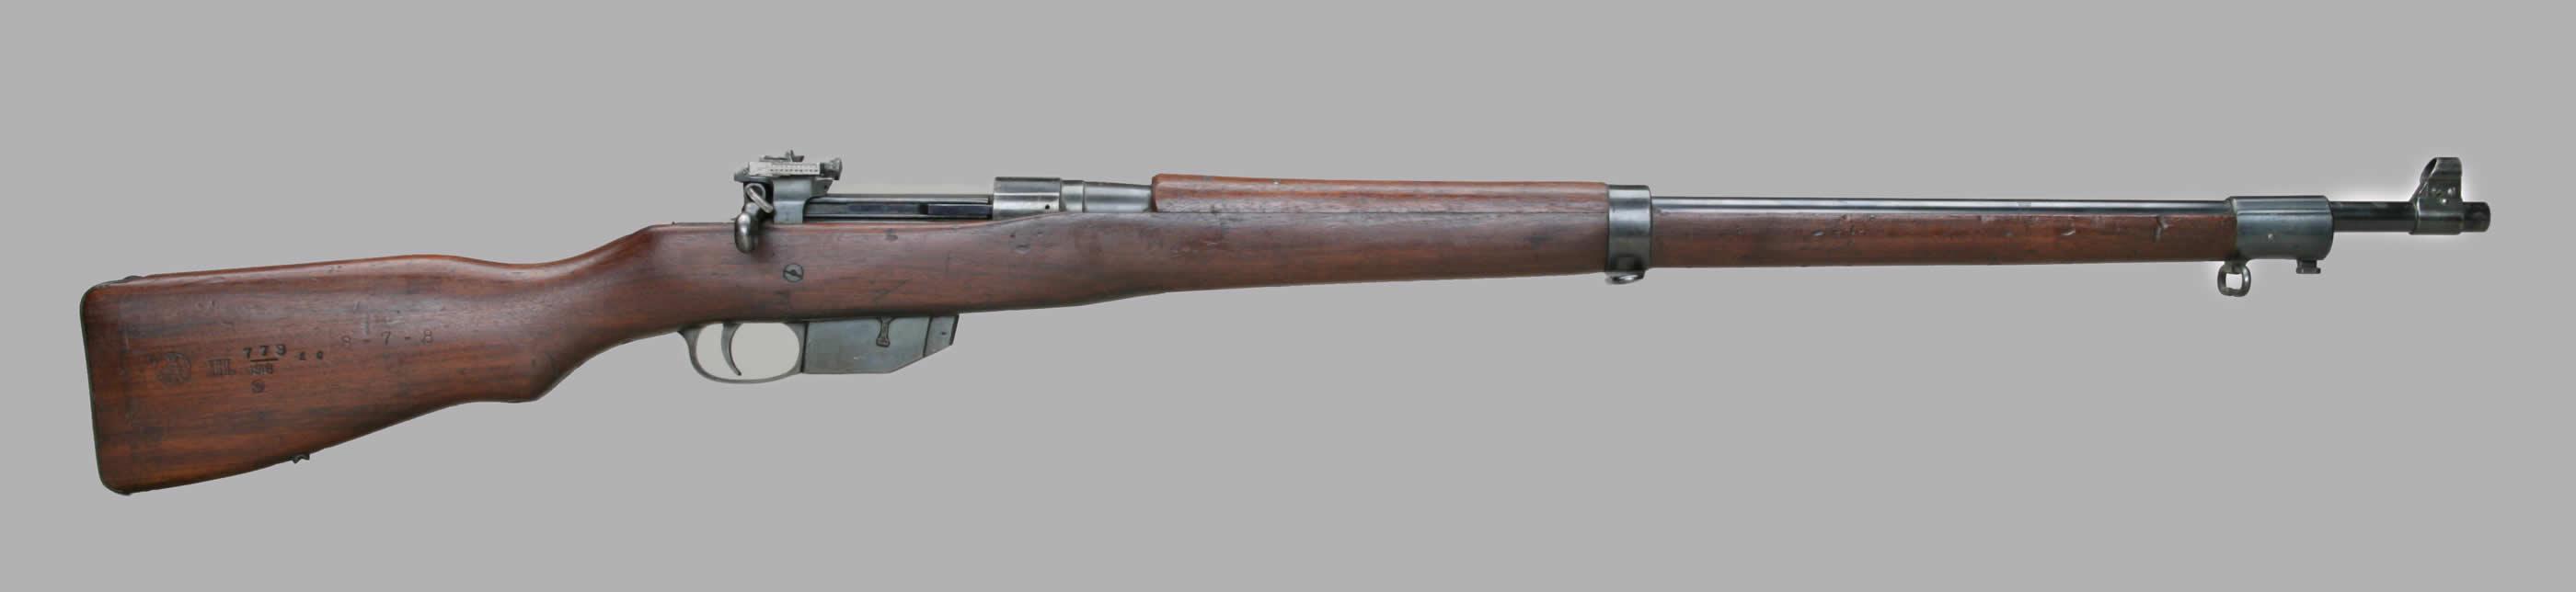 Fusil Ross MK III